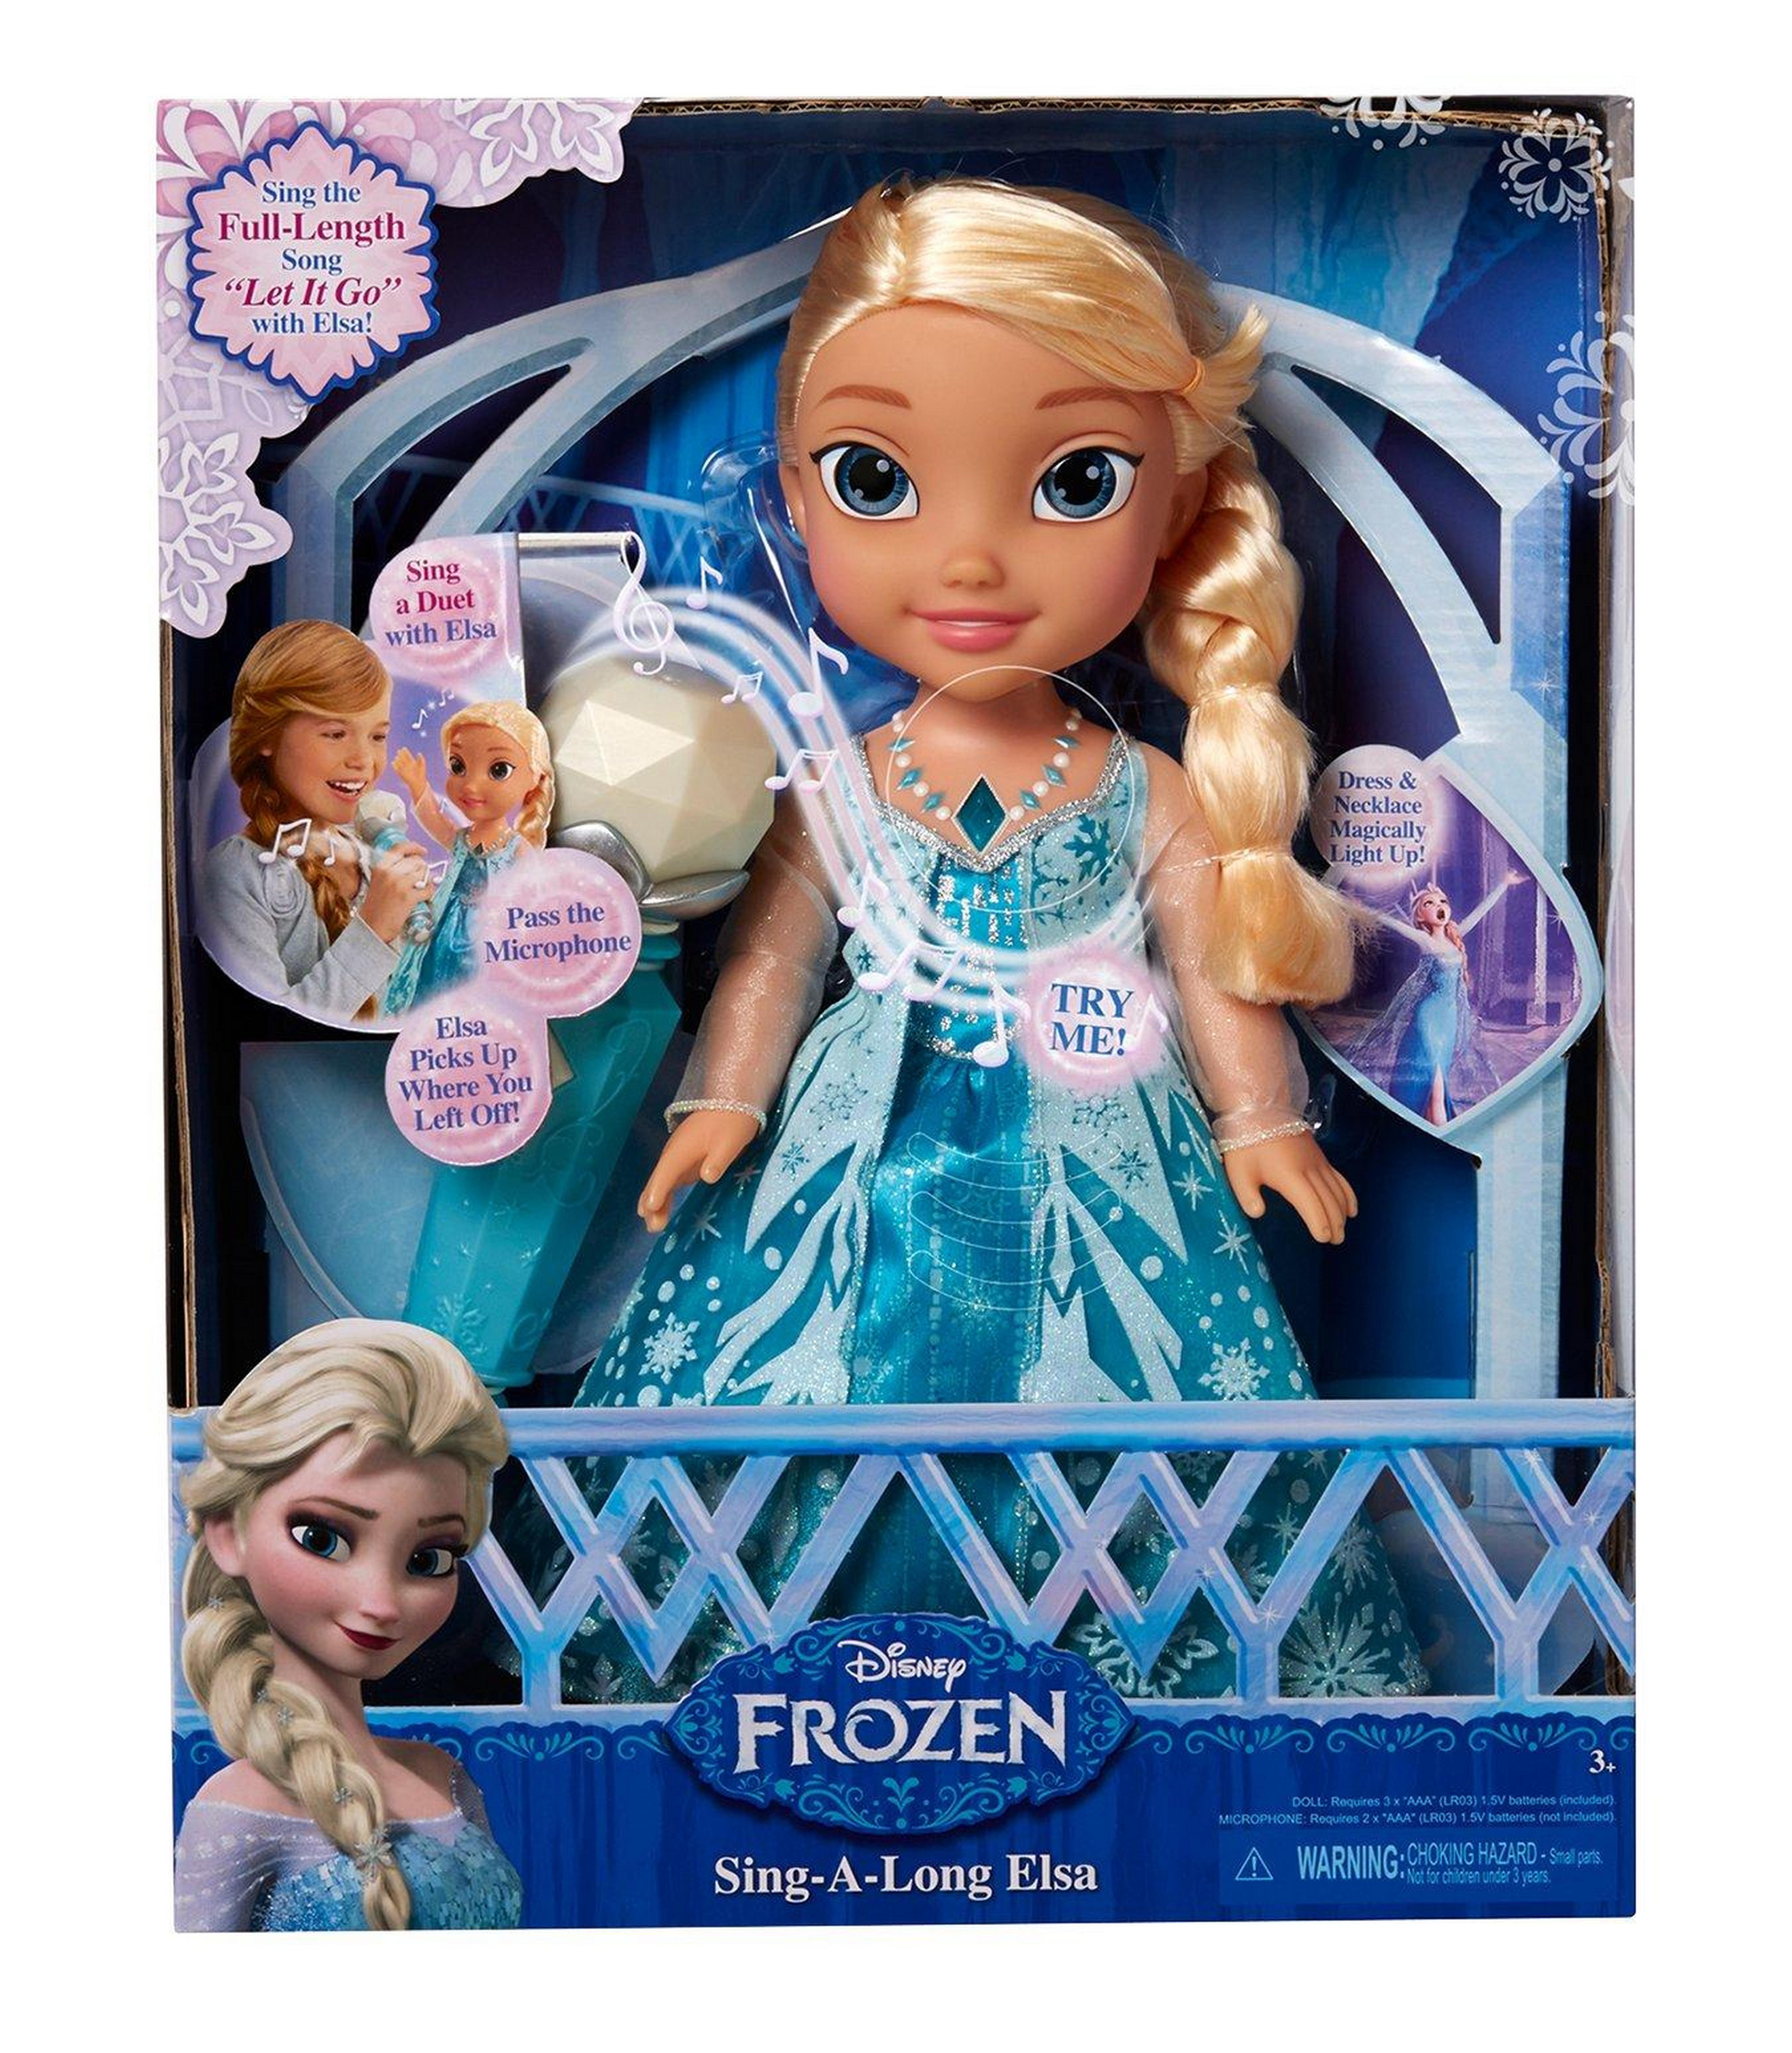 Let The Magic Begin Top 10 Children s Toys For Christmas 2015 Heart